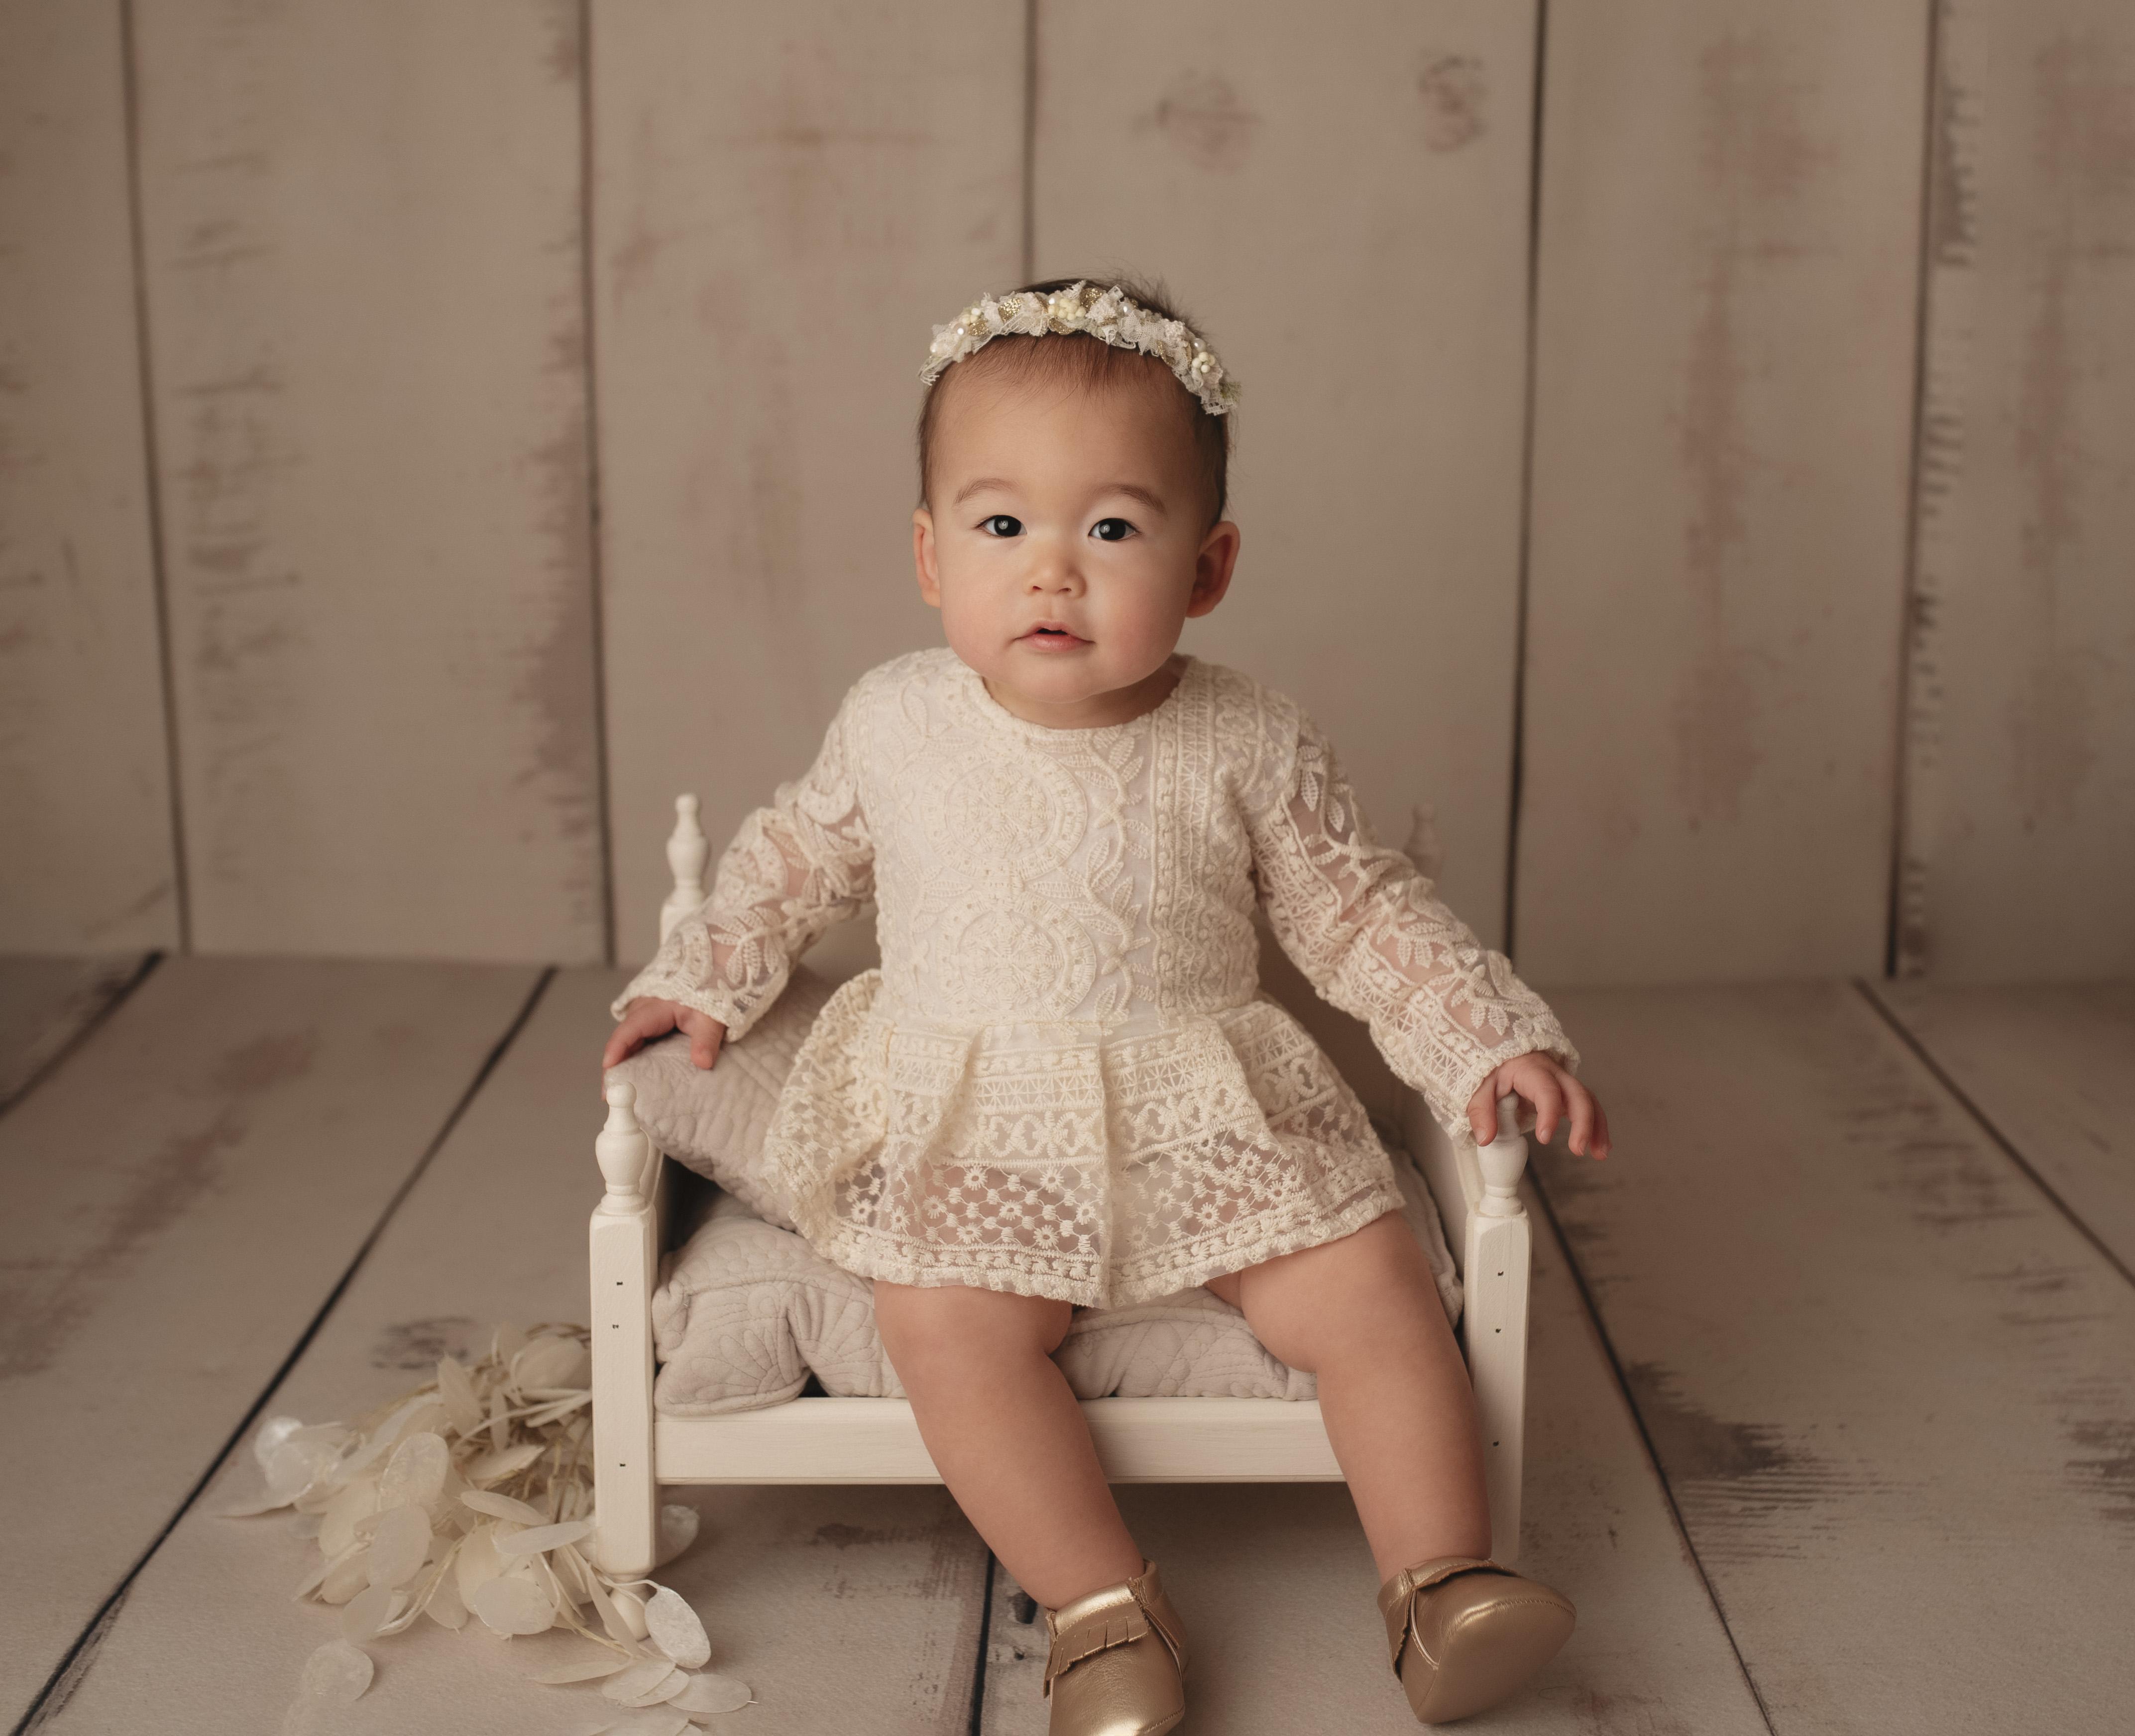 grand rapids michigan child photographer milestone studio shoot